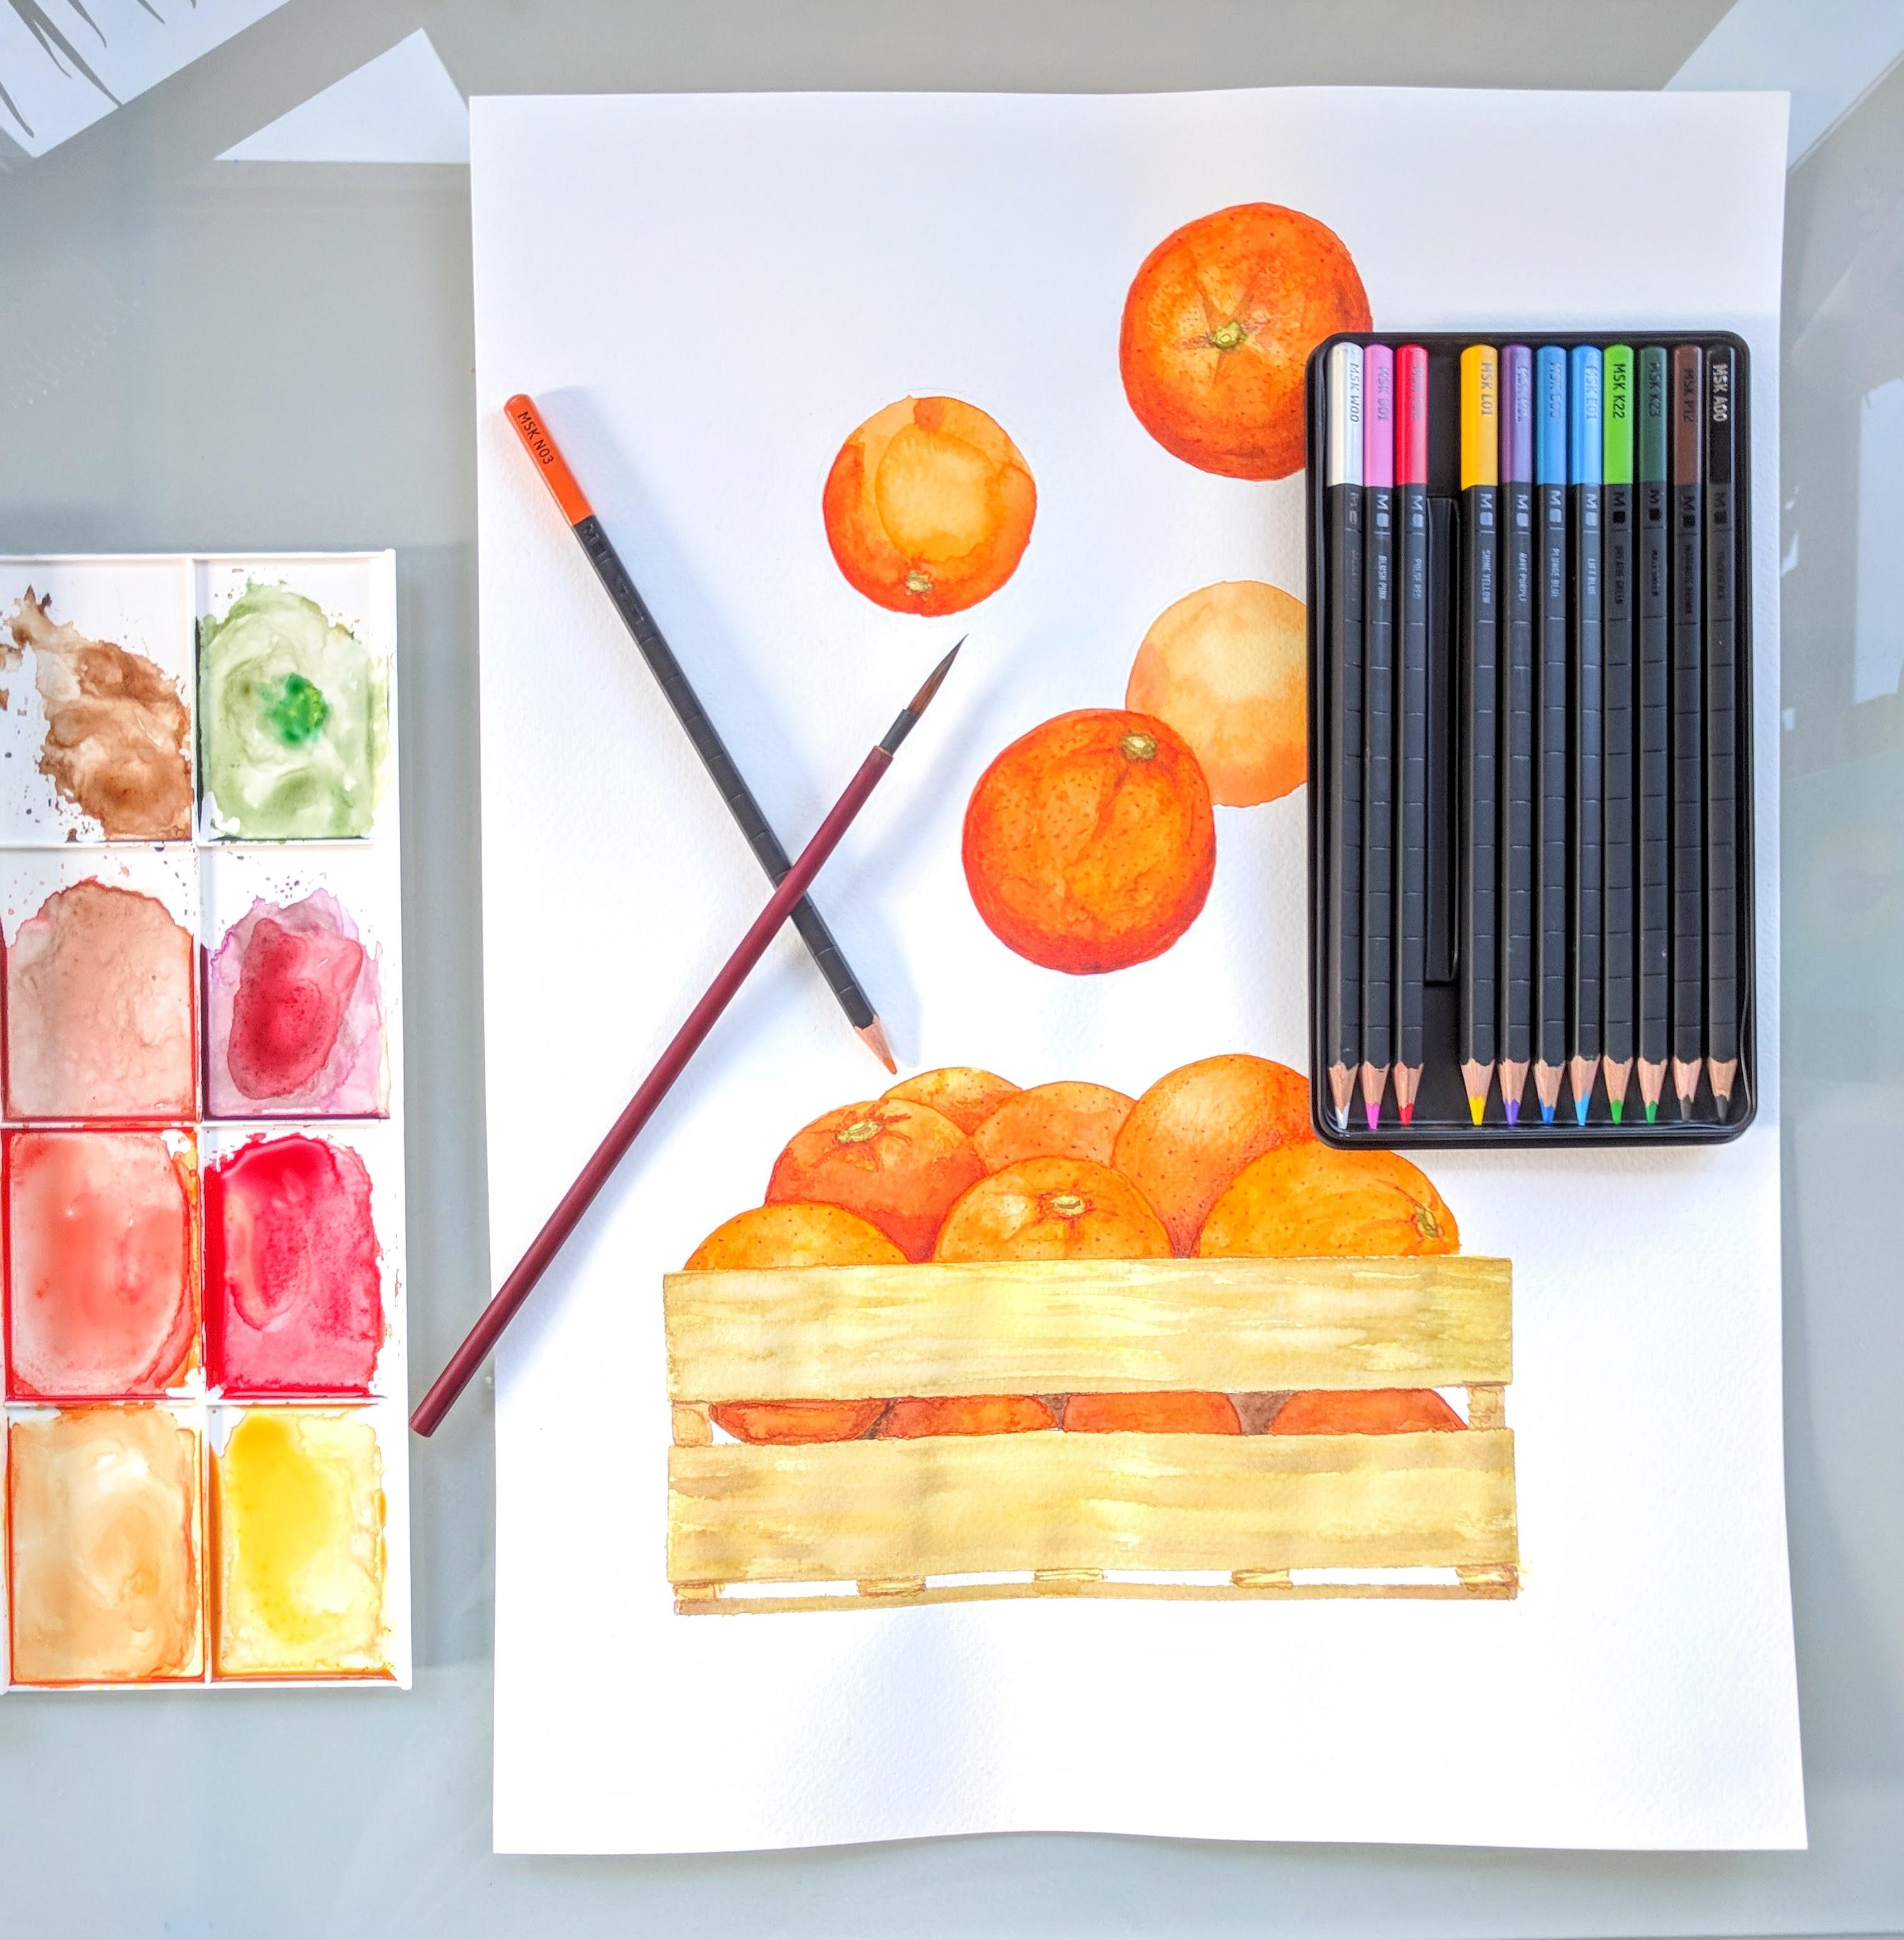 New Moleskine watercolor pencils